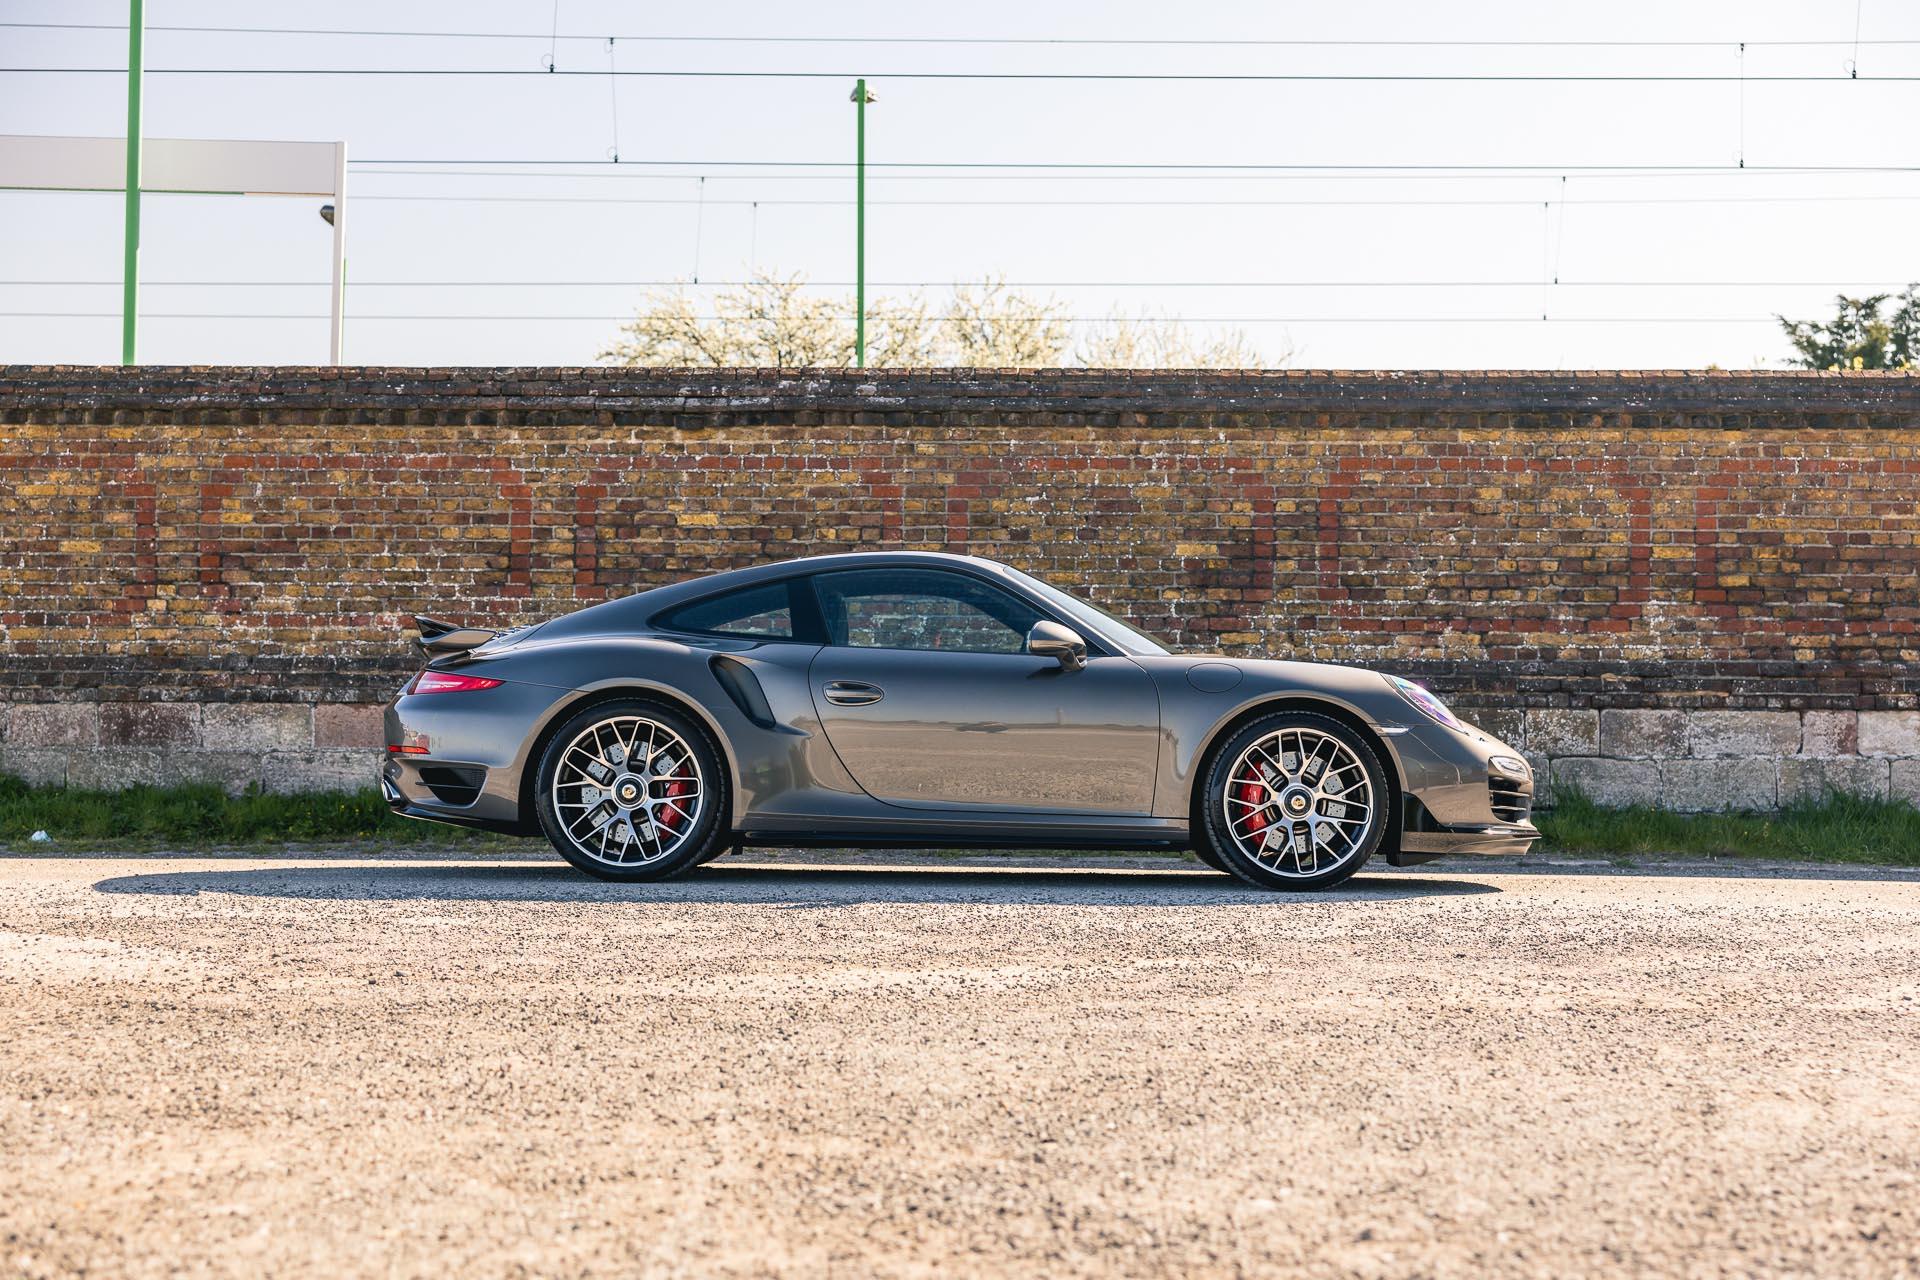 991-turbo-side-profile